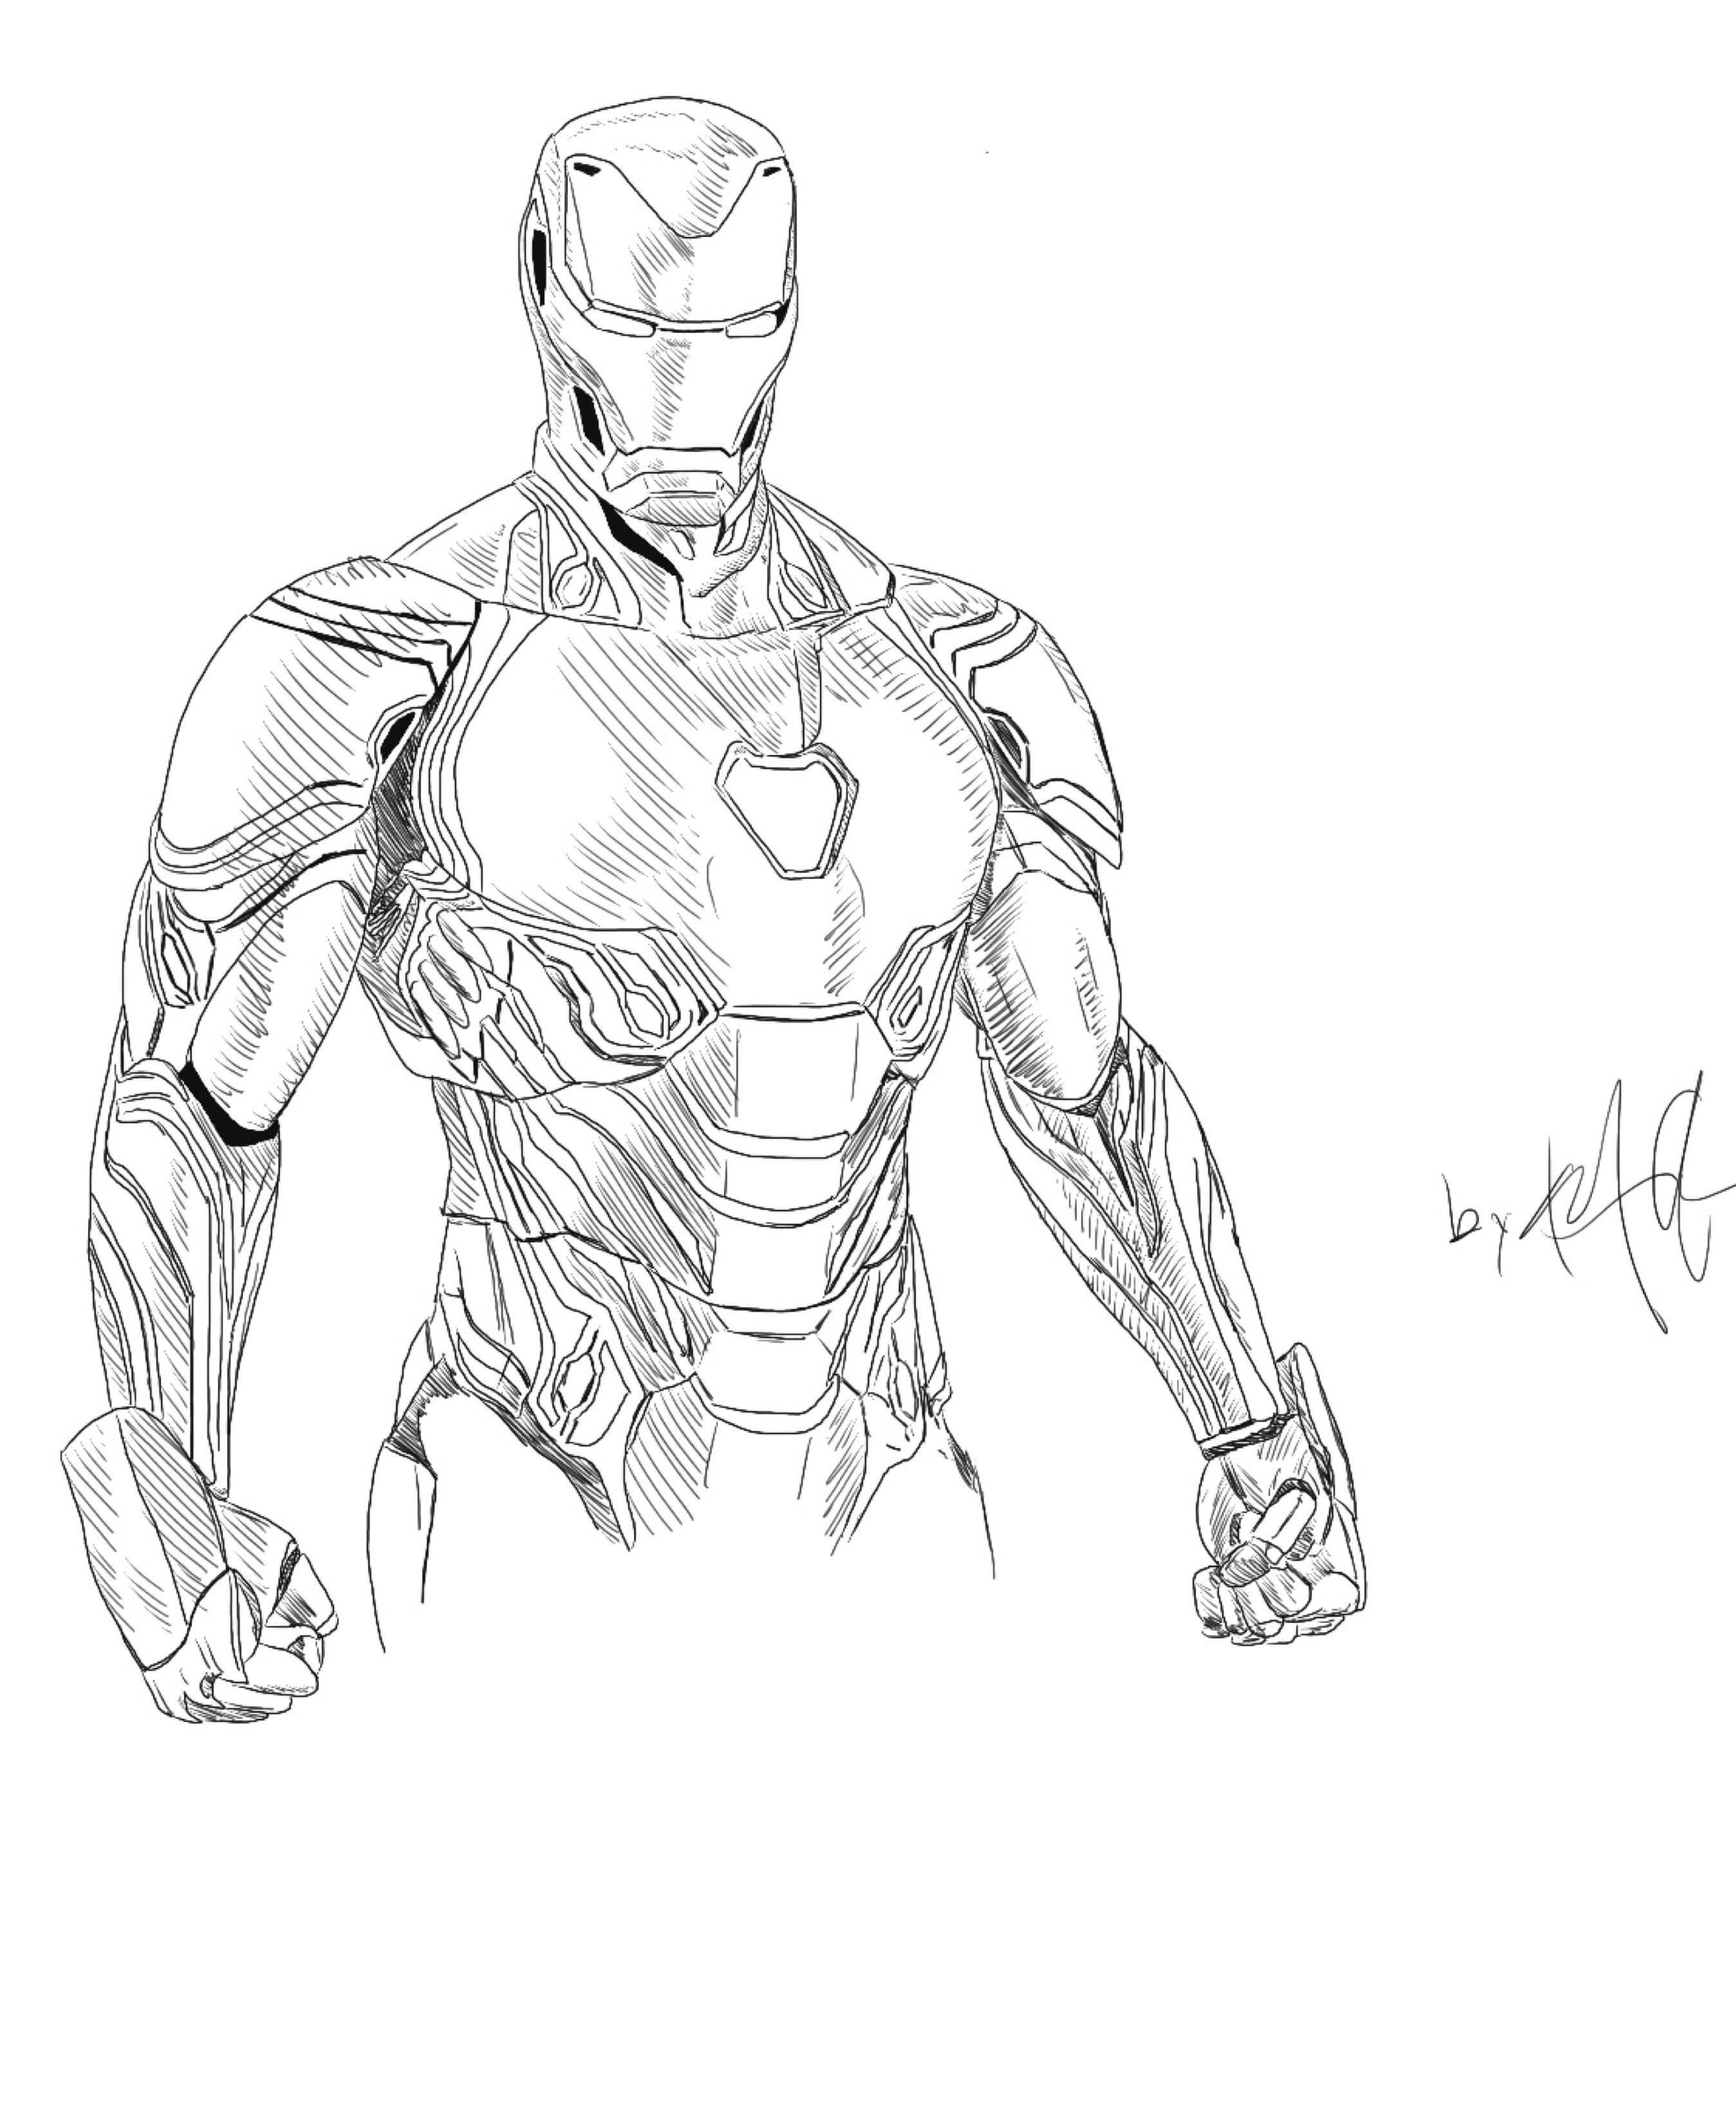 Dibujos De Iron Man Para Colorear Paginas Para Colorear